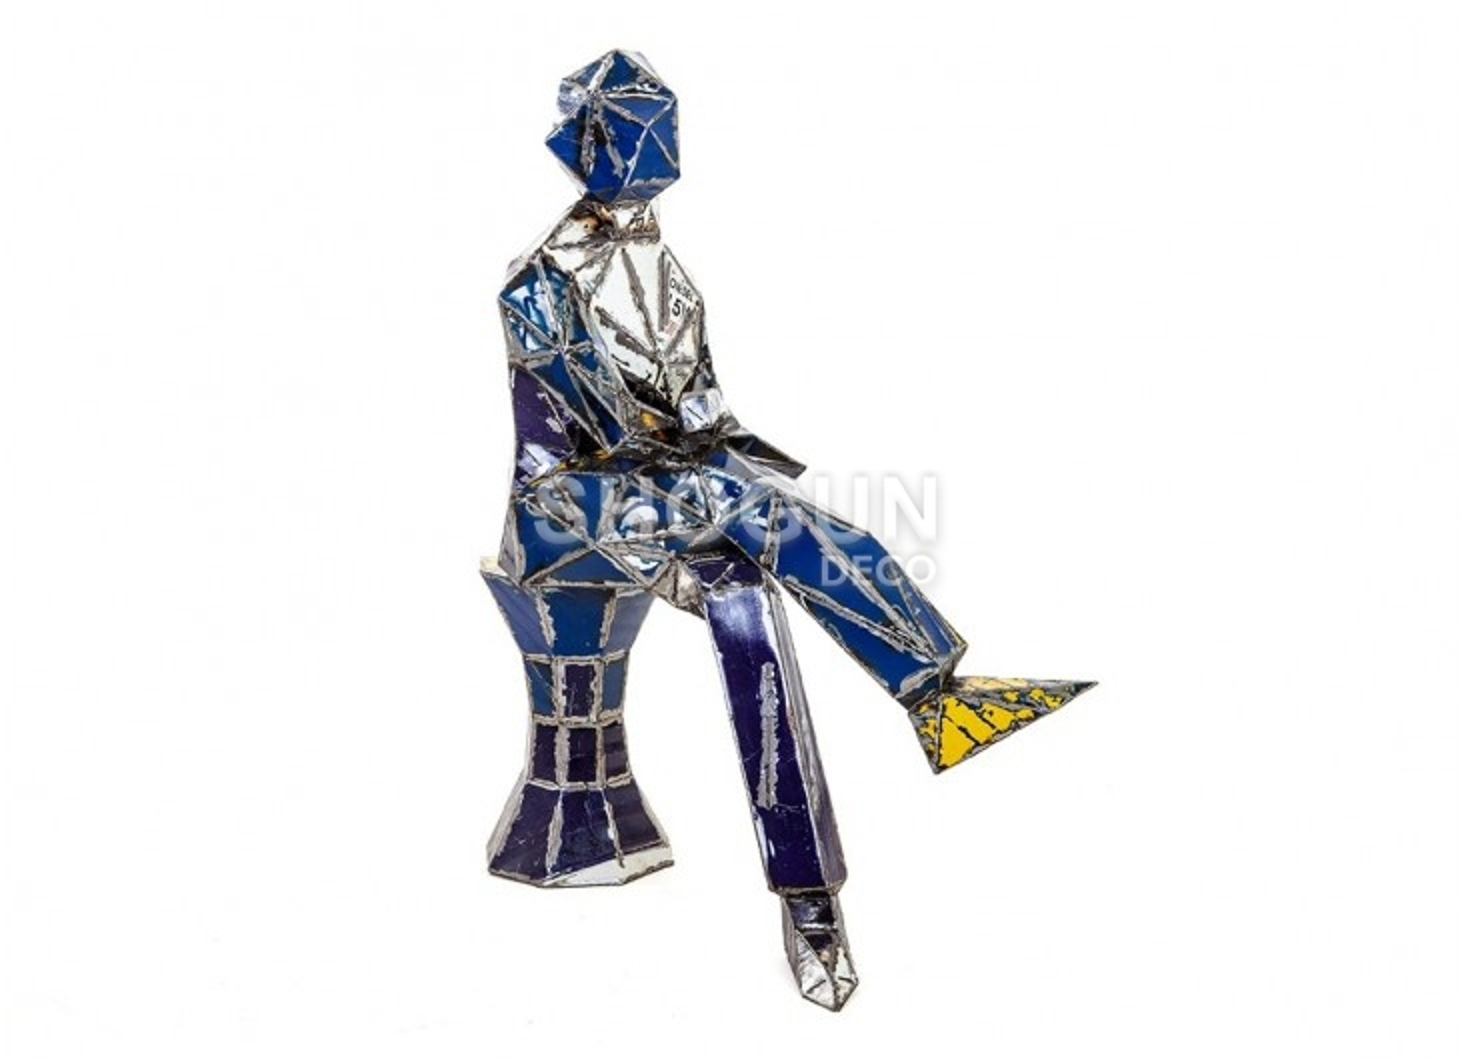 Statue en bidon recyclé - artisanat